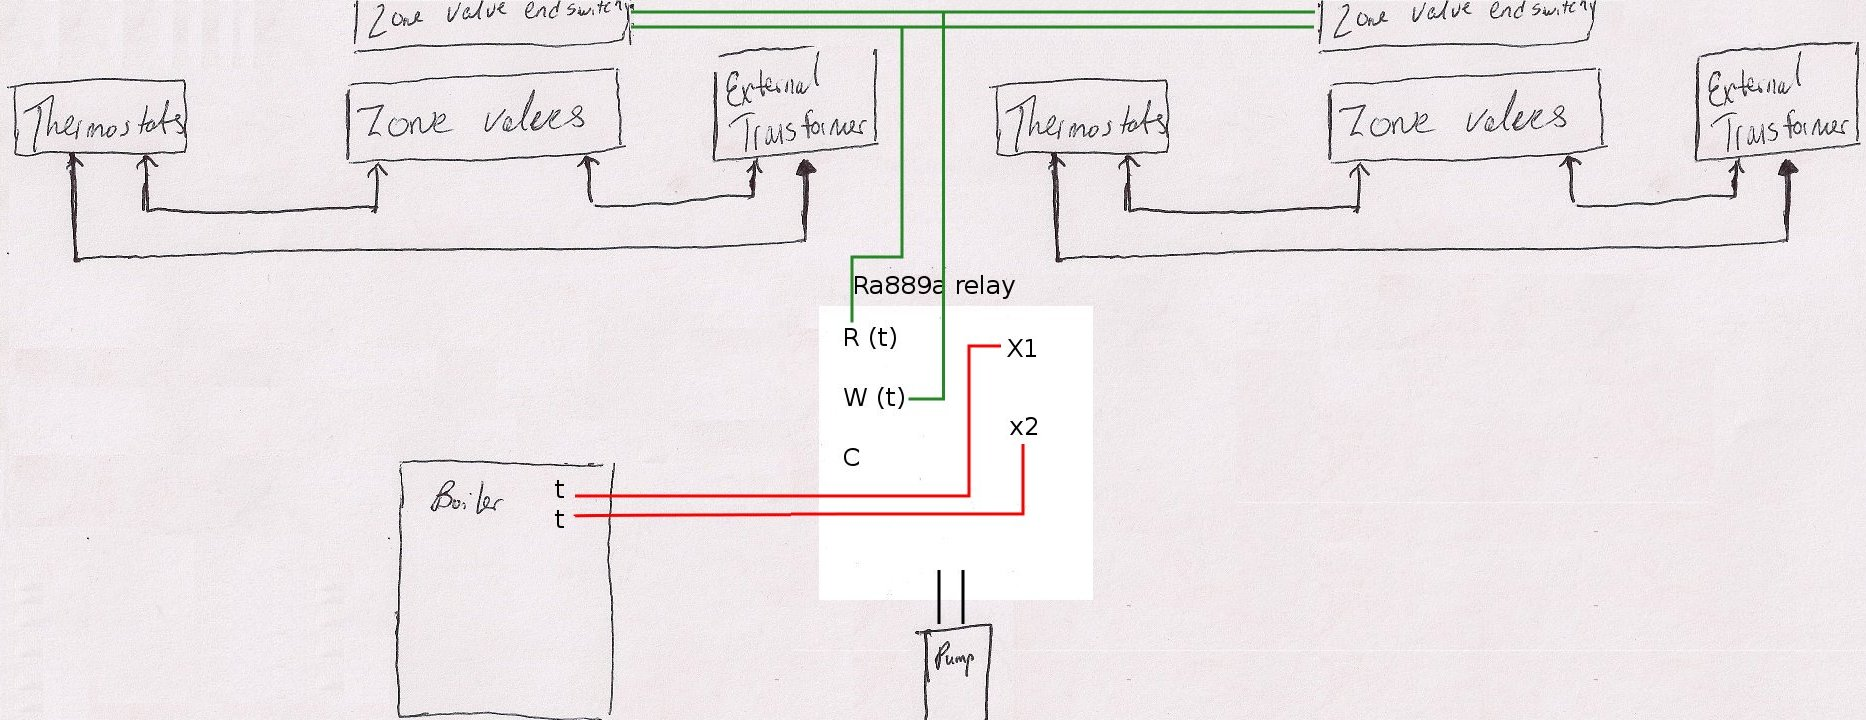 Honeywell Zone Valve Wiring Diagram How It Works V8043e1061